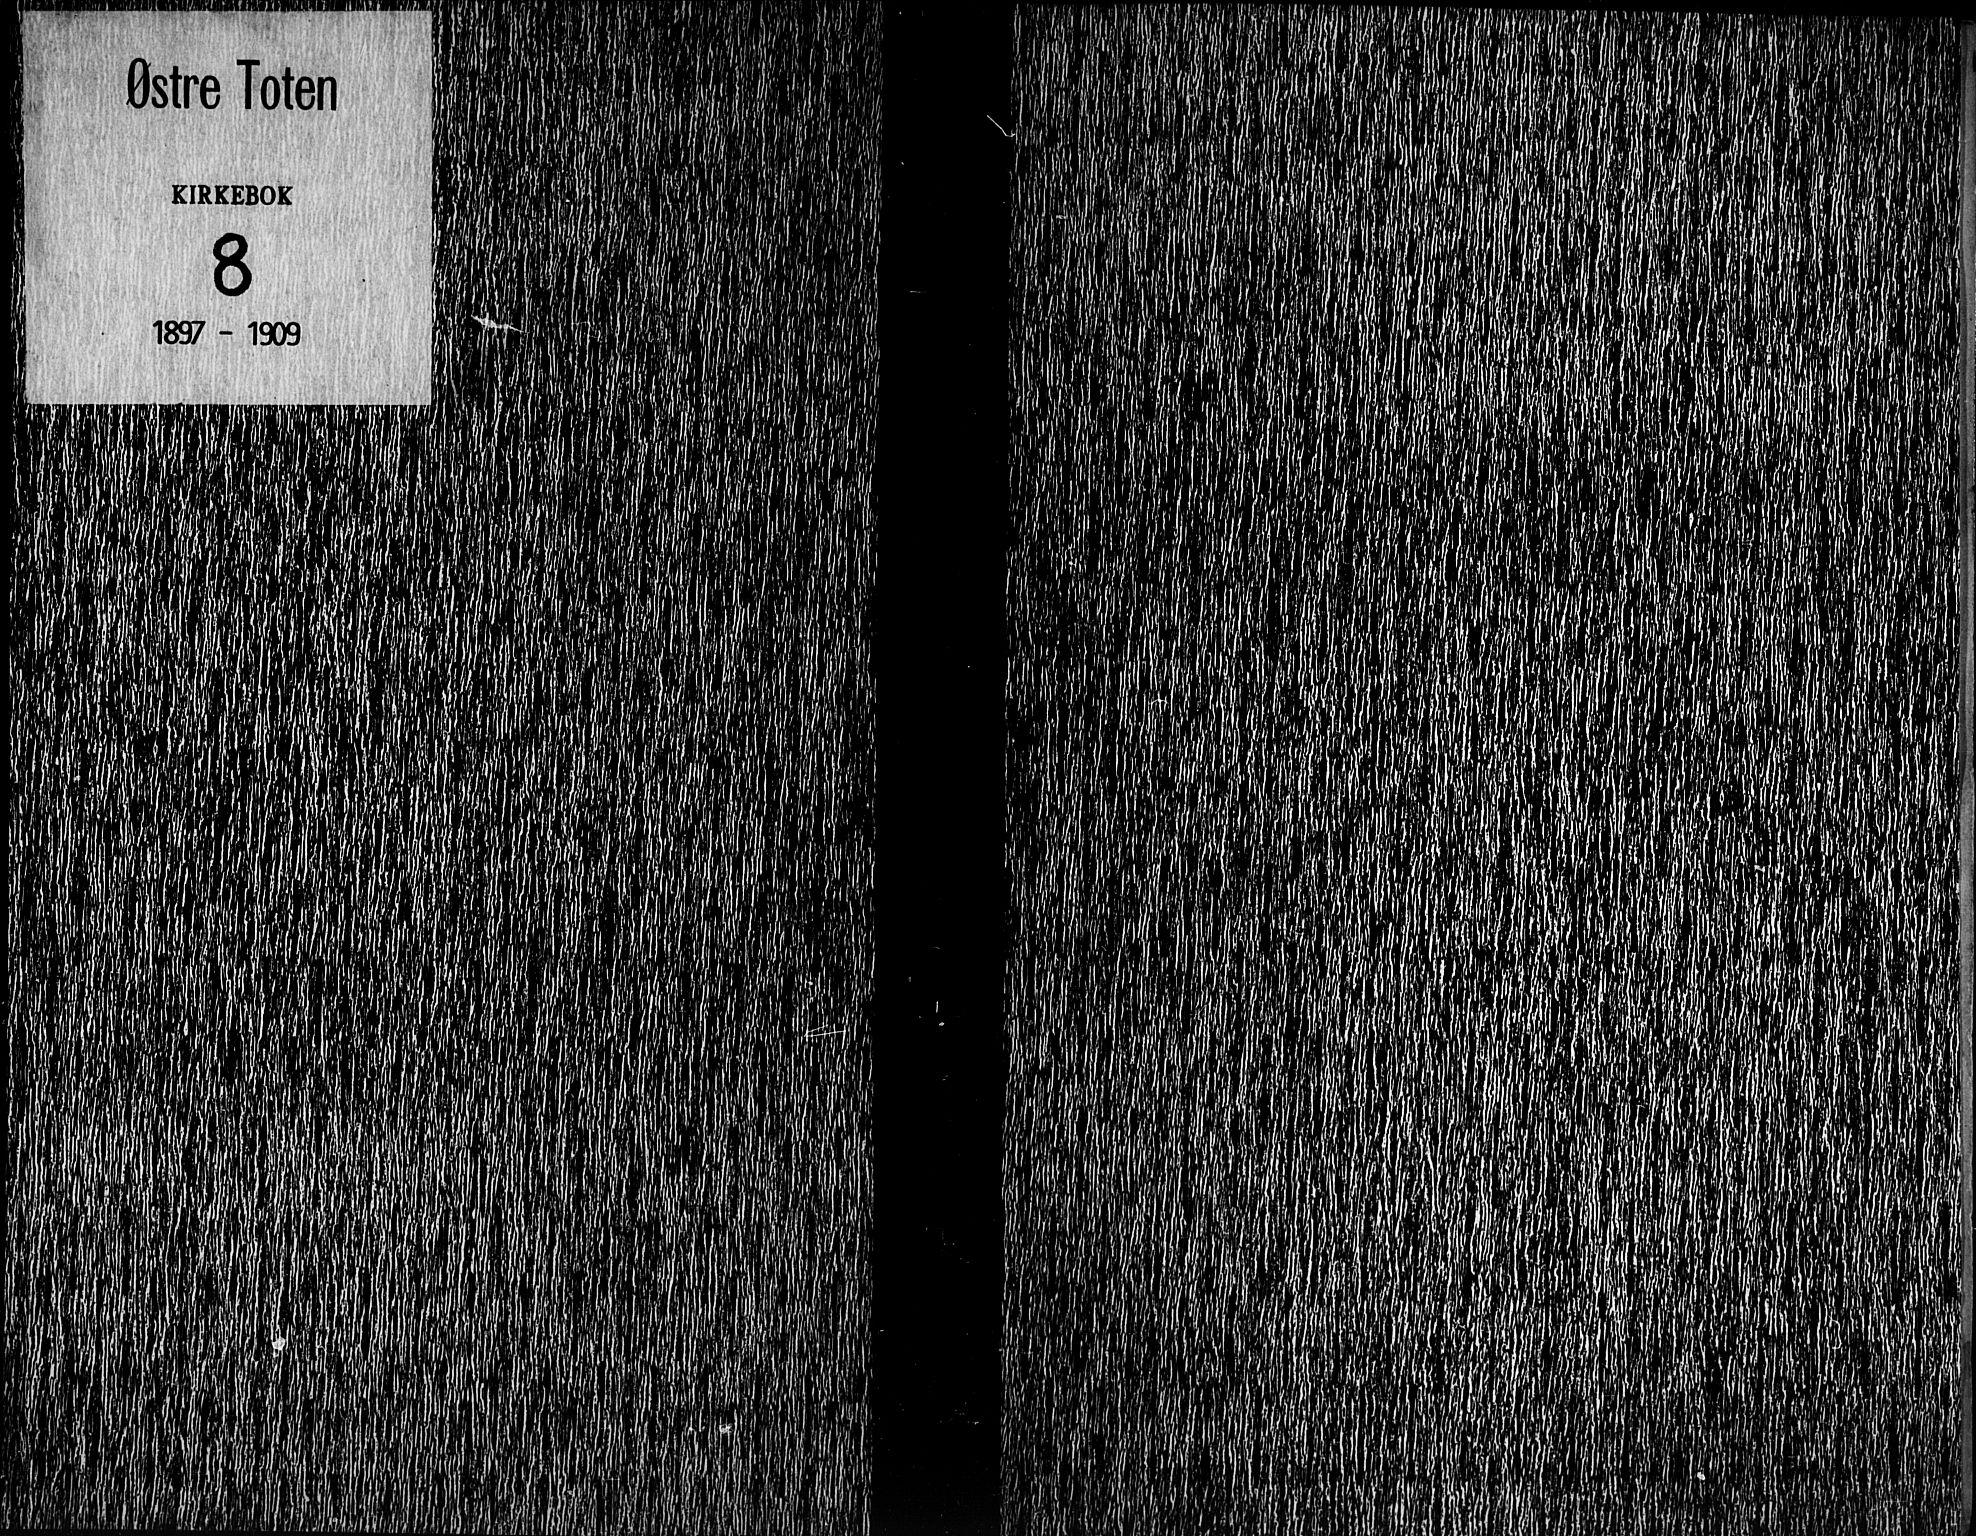 SAH, Østre Toten prestekontor, Ministerialbok nr. 8, 1897-1909